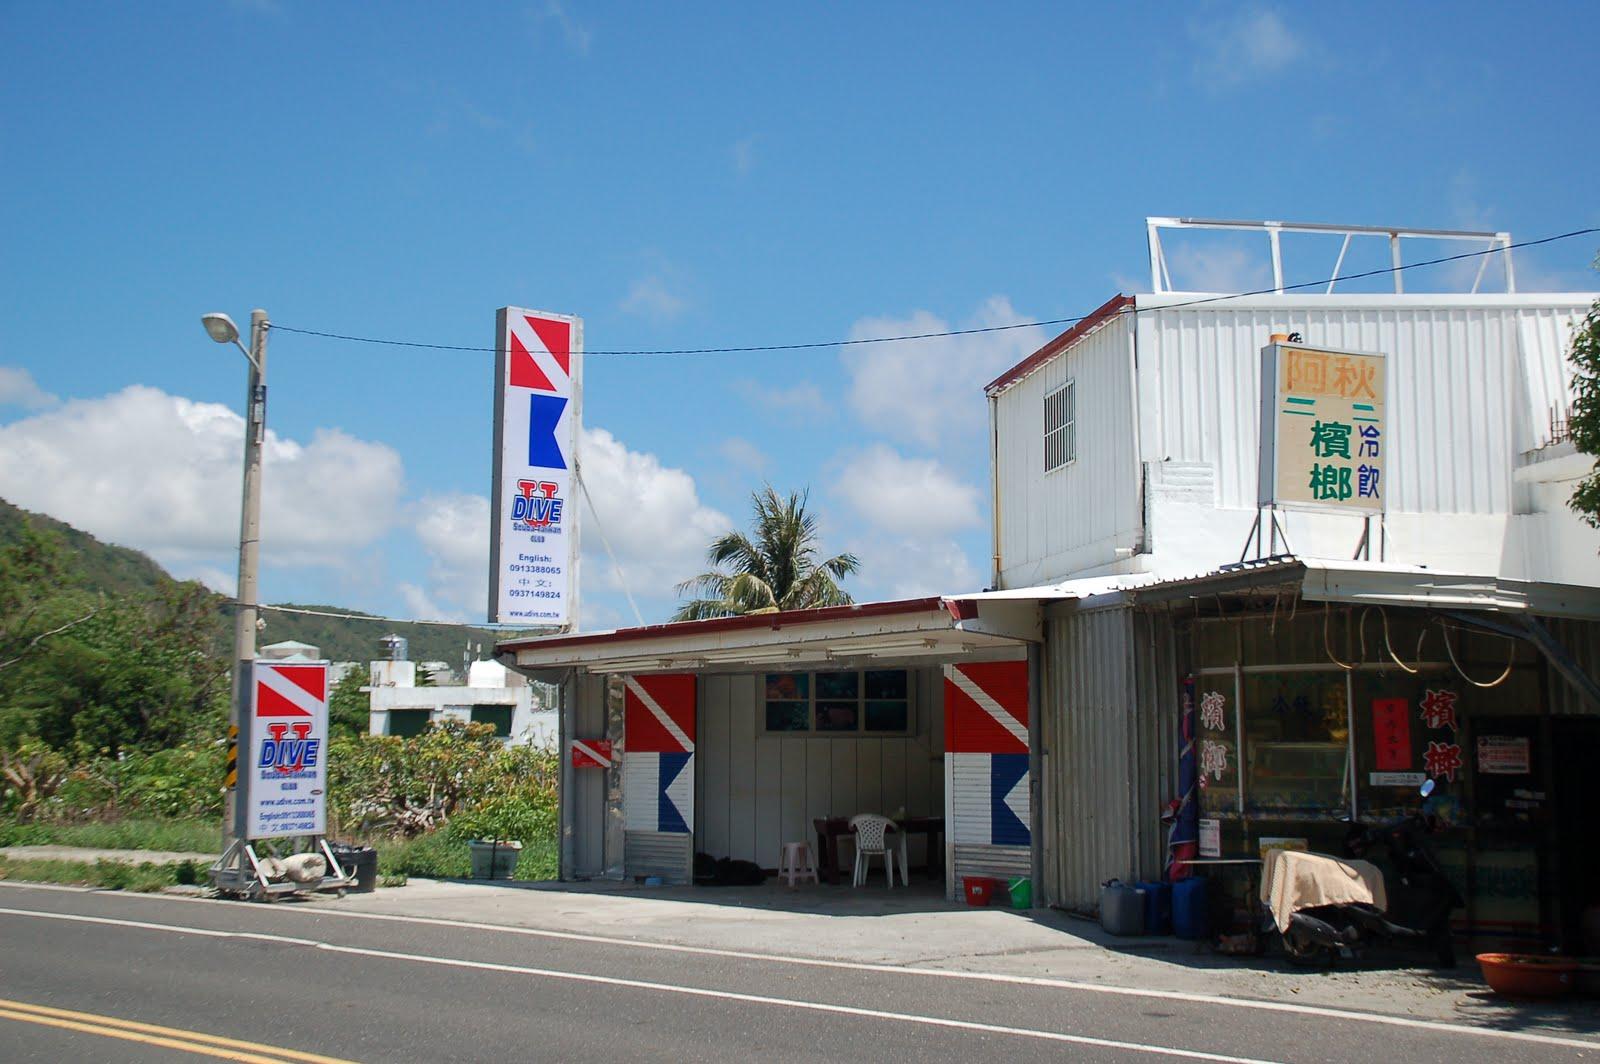 UDive dive shop & hostel